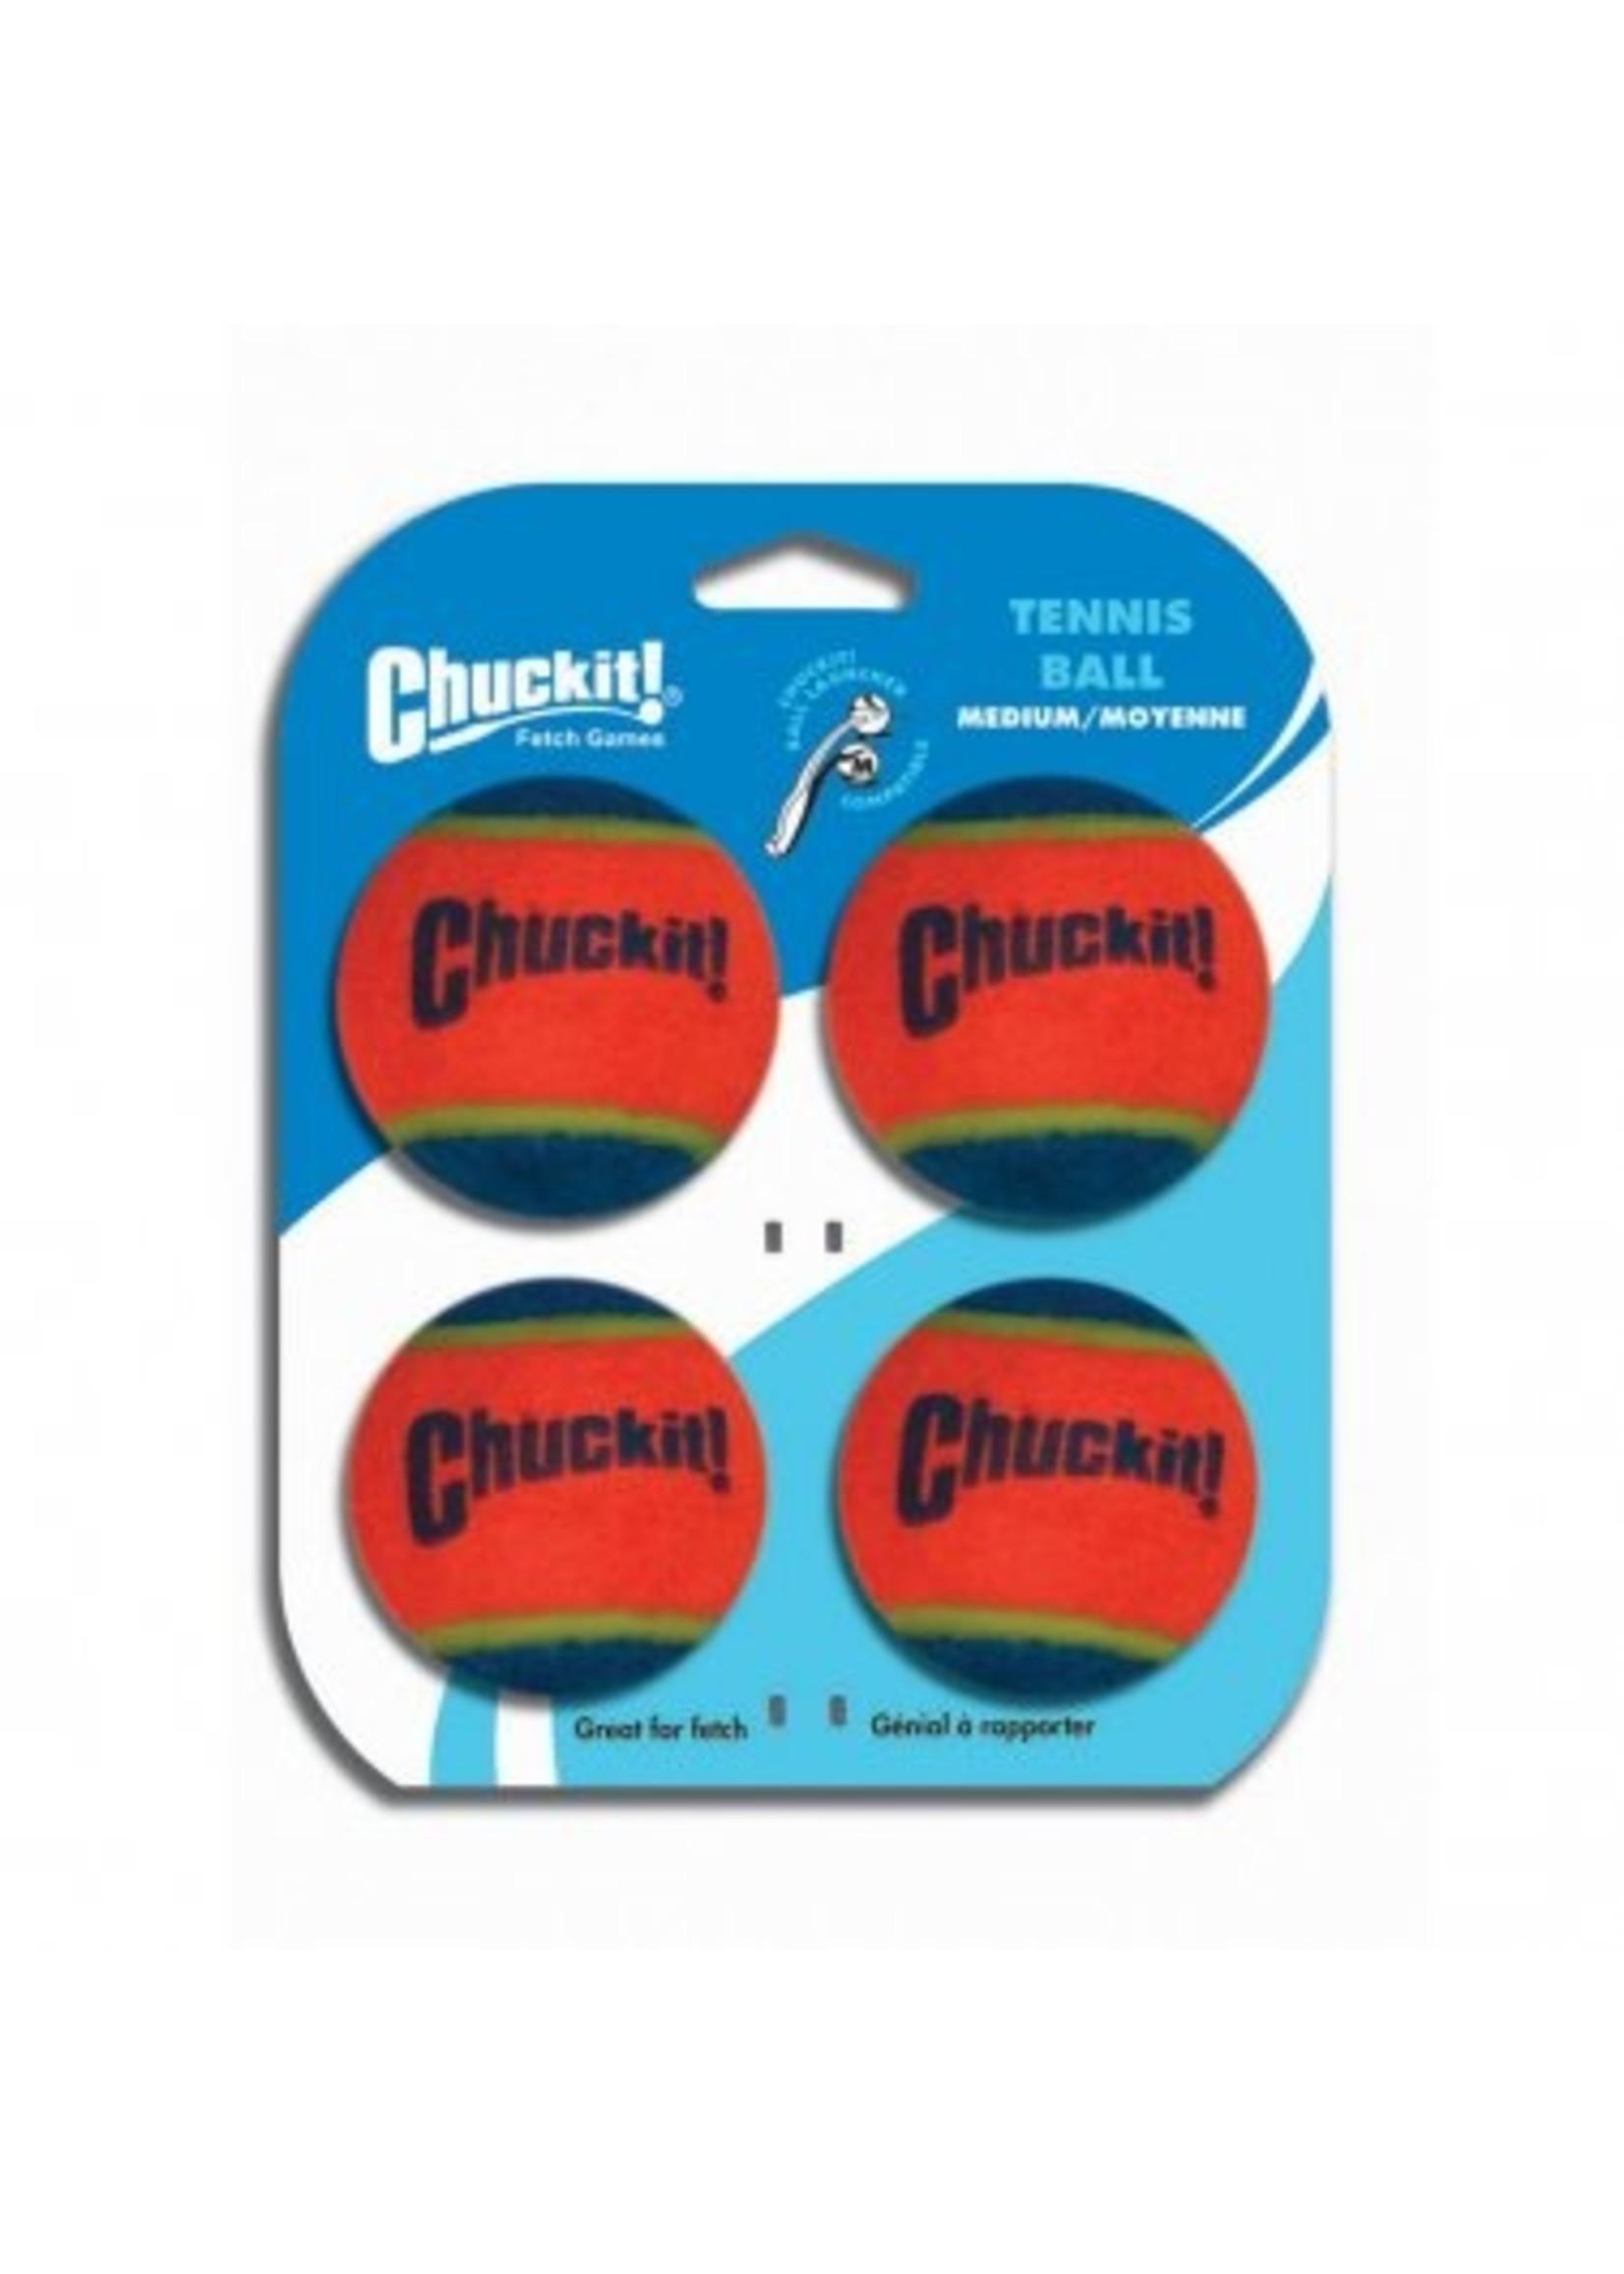 Chuckit!® Chuckit! Tennis Ball 4 Pack